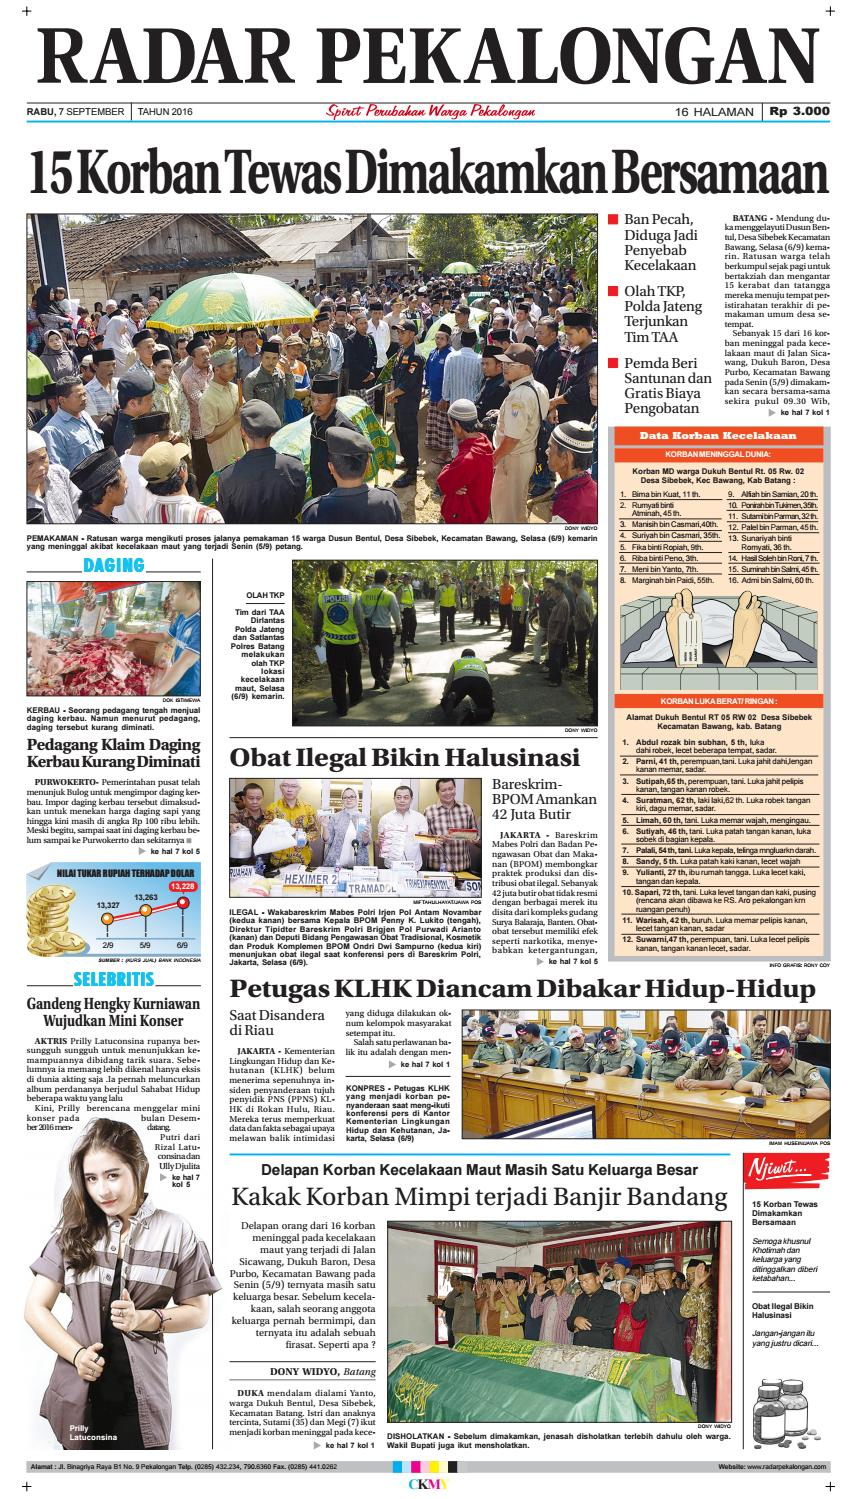 Radar Pekalongan 11 Desember 2014 By Issuu Rkb Tegal Madu Mongso 7 September 2016